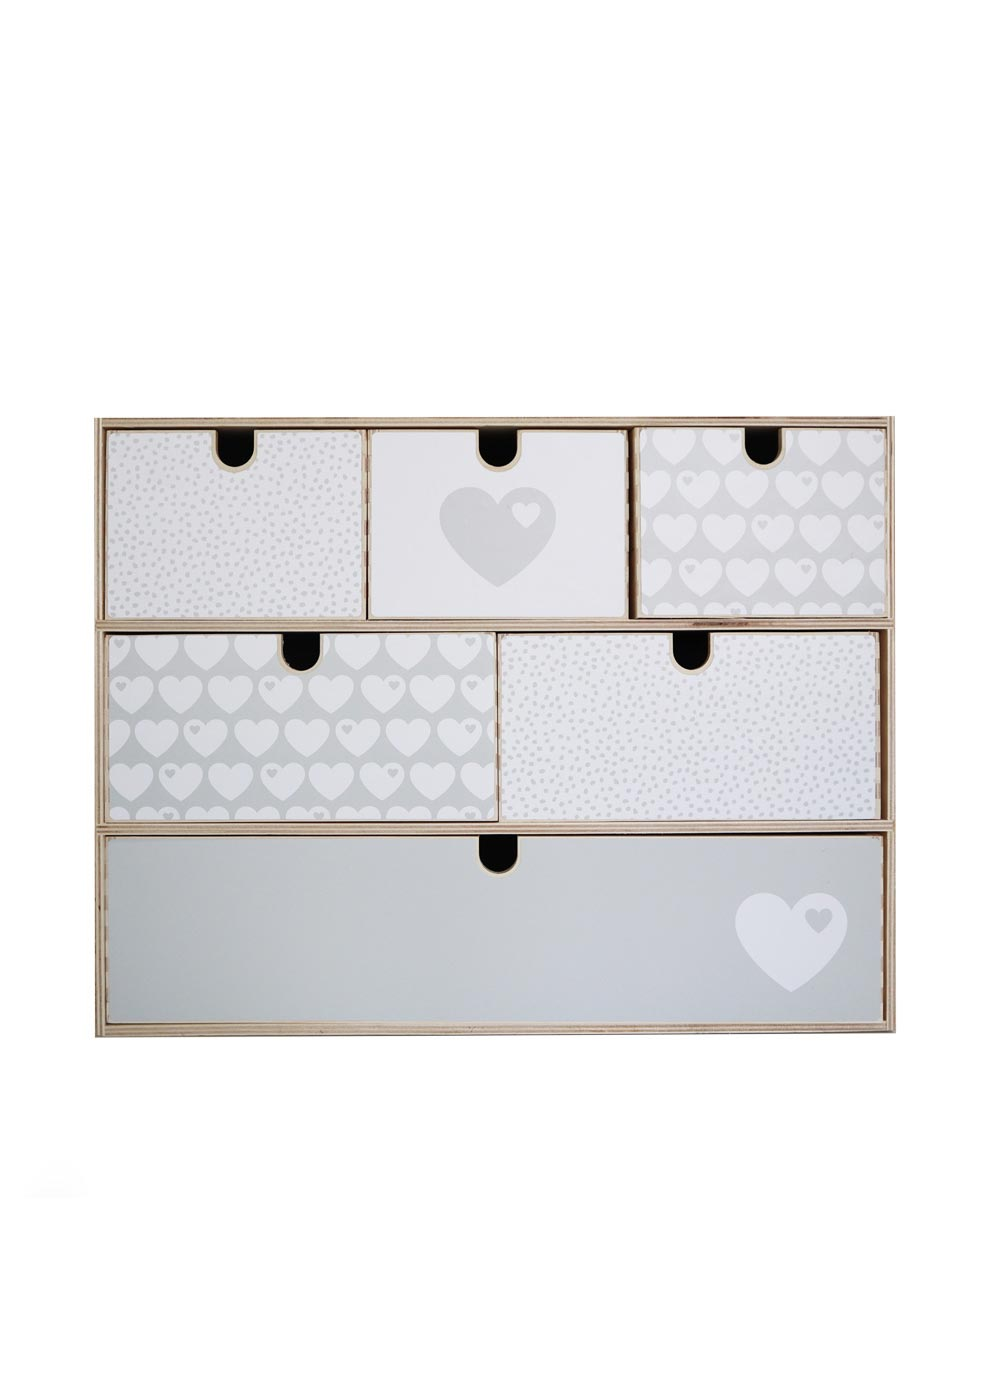 Klebefolie Ikea Moppe ByGraziela grau Herz Frontansicht